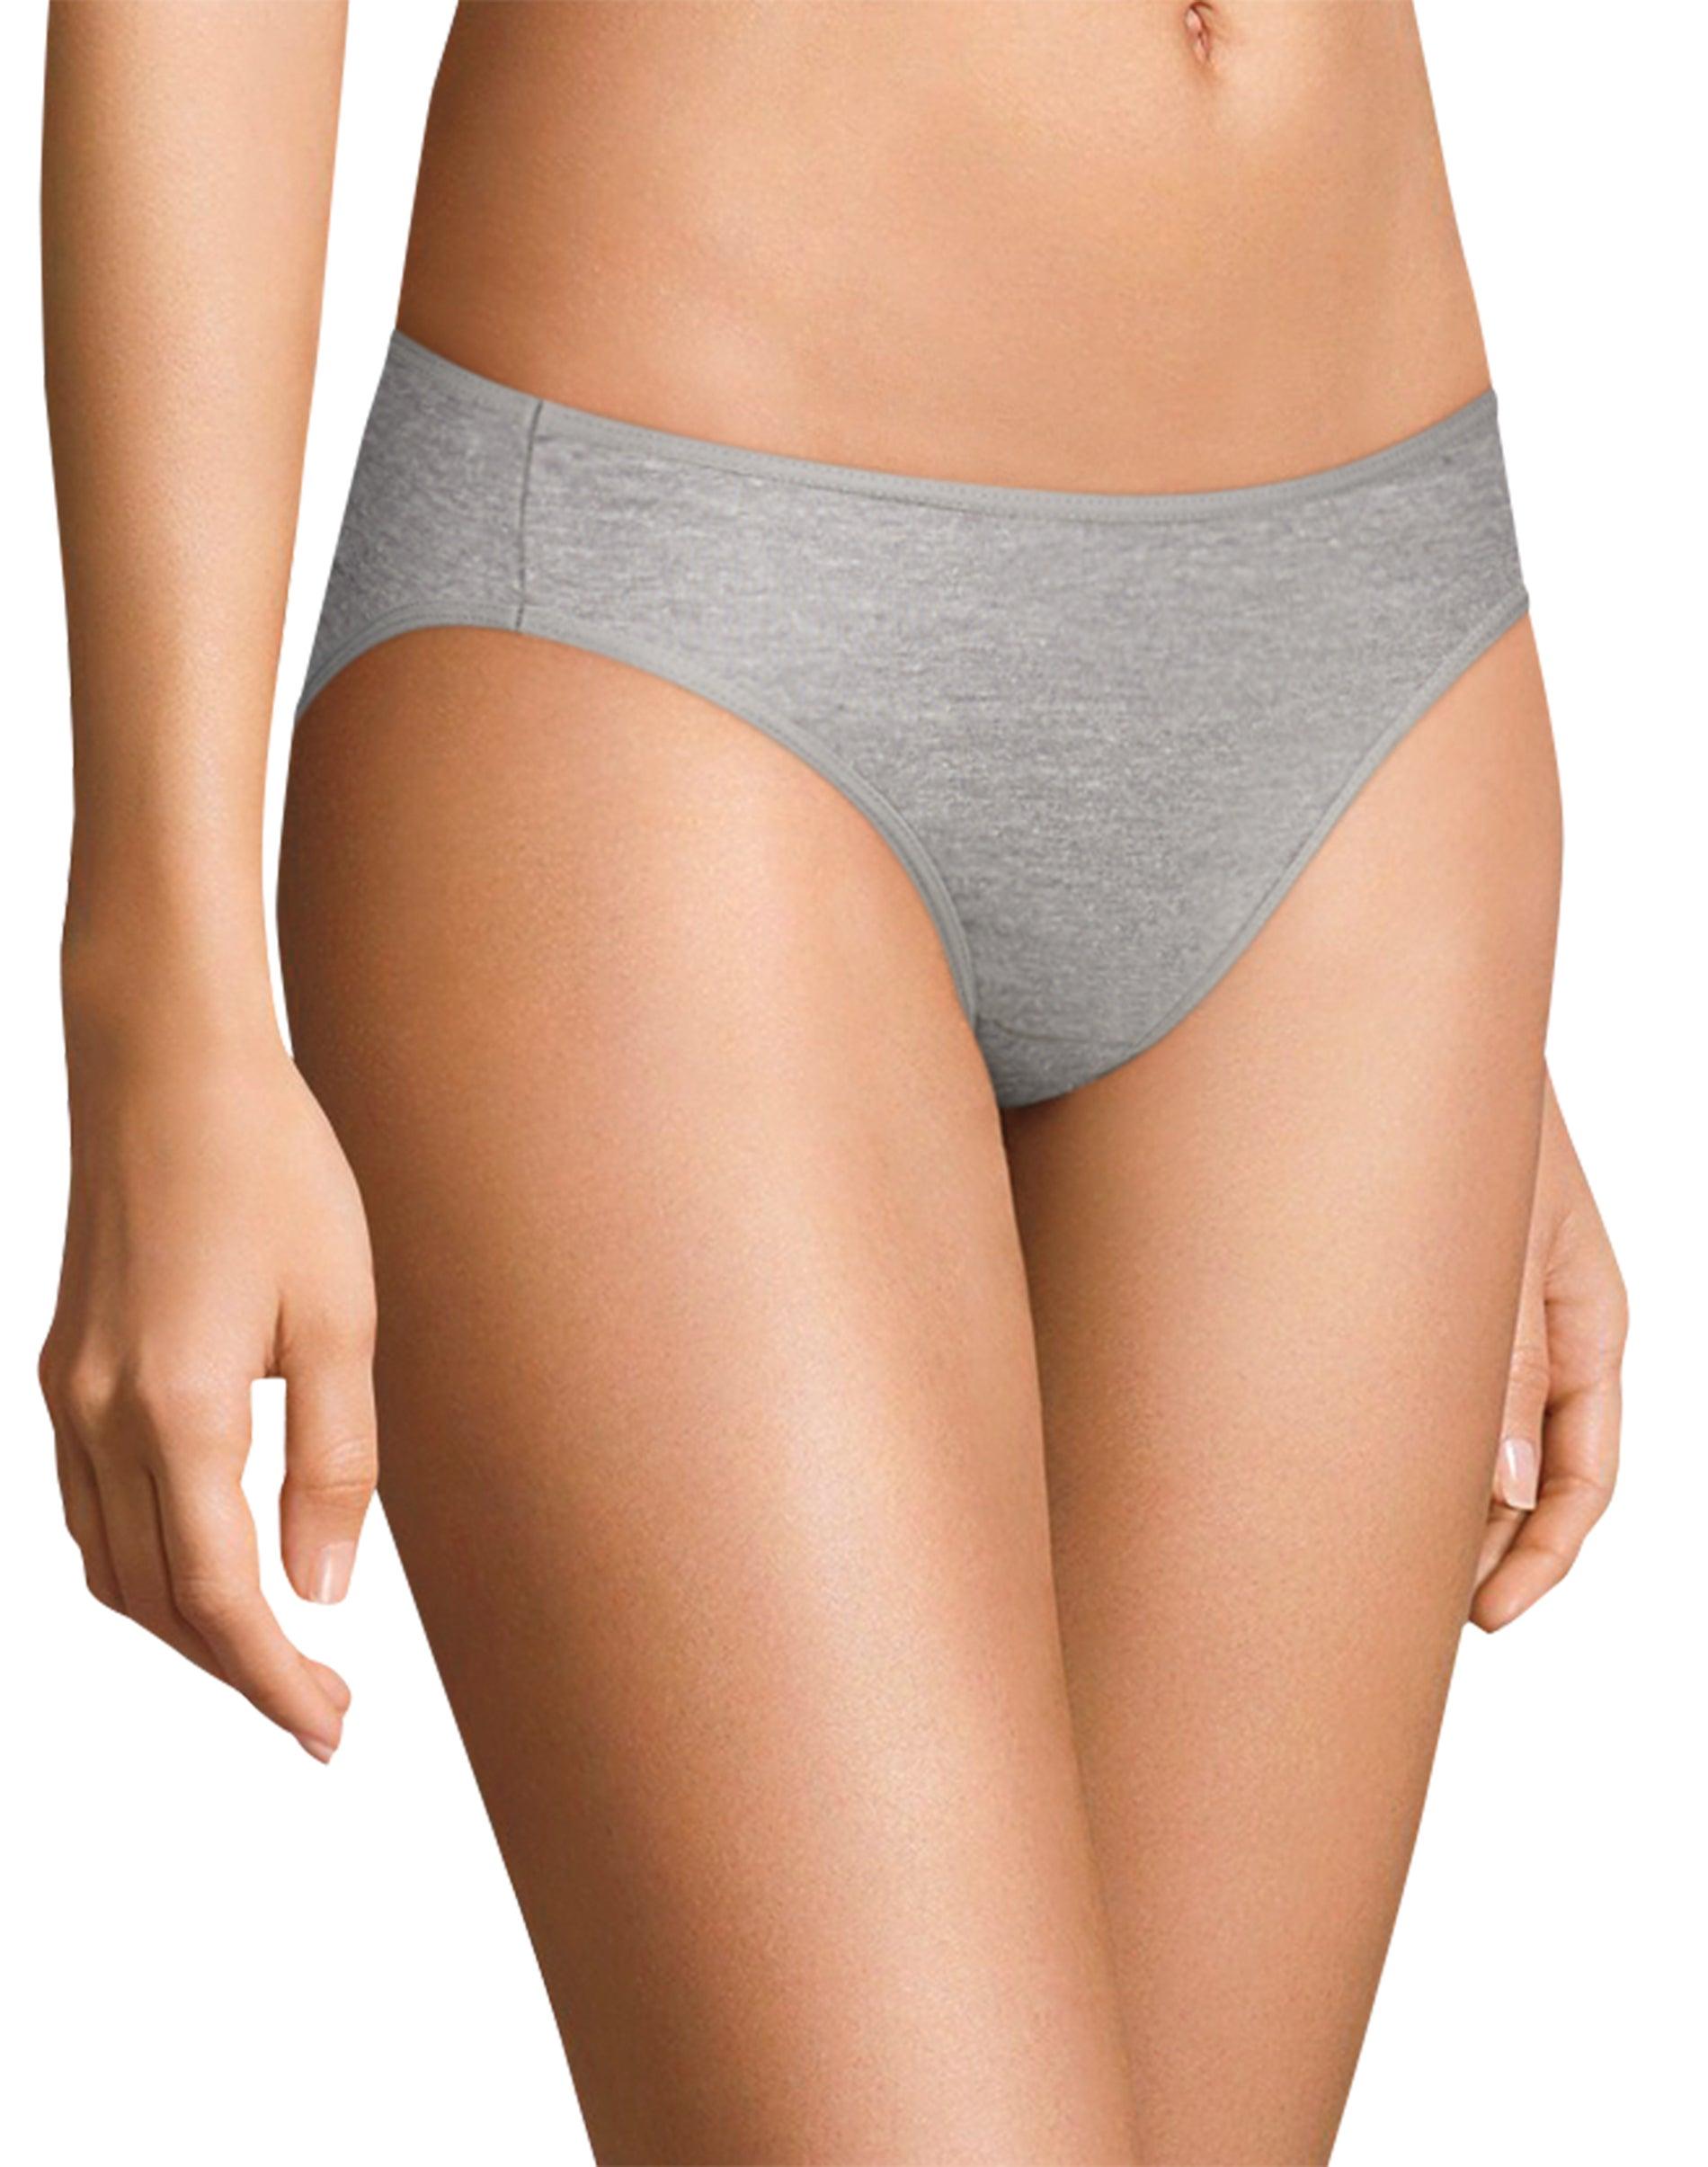 Hanes Womens Ultimate Womens Cotton Comfort Ultra Soft Bikinis Bikini Style Underwear